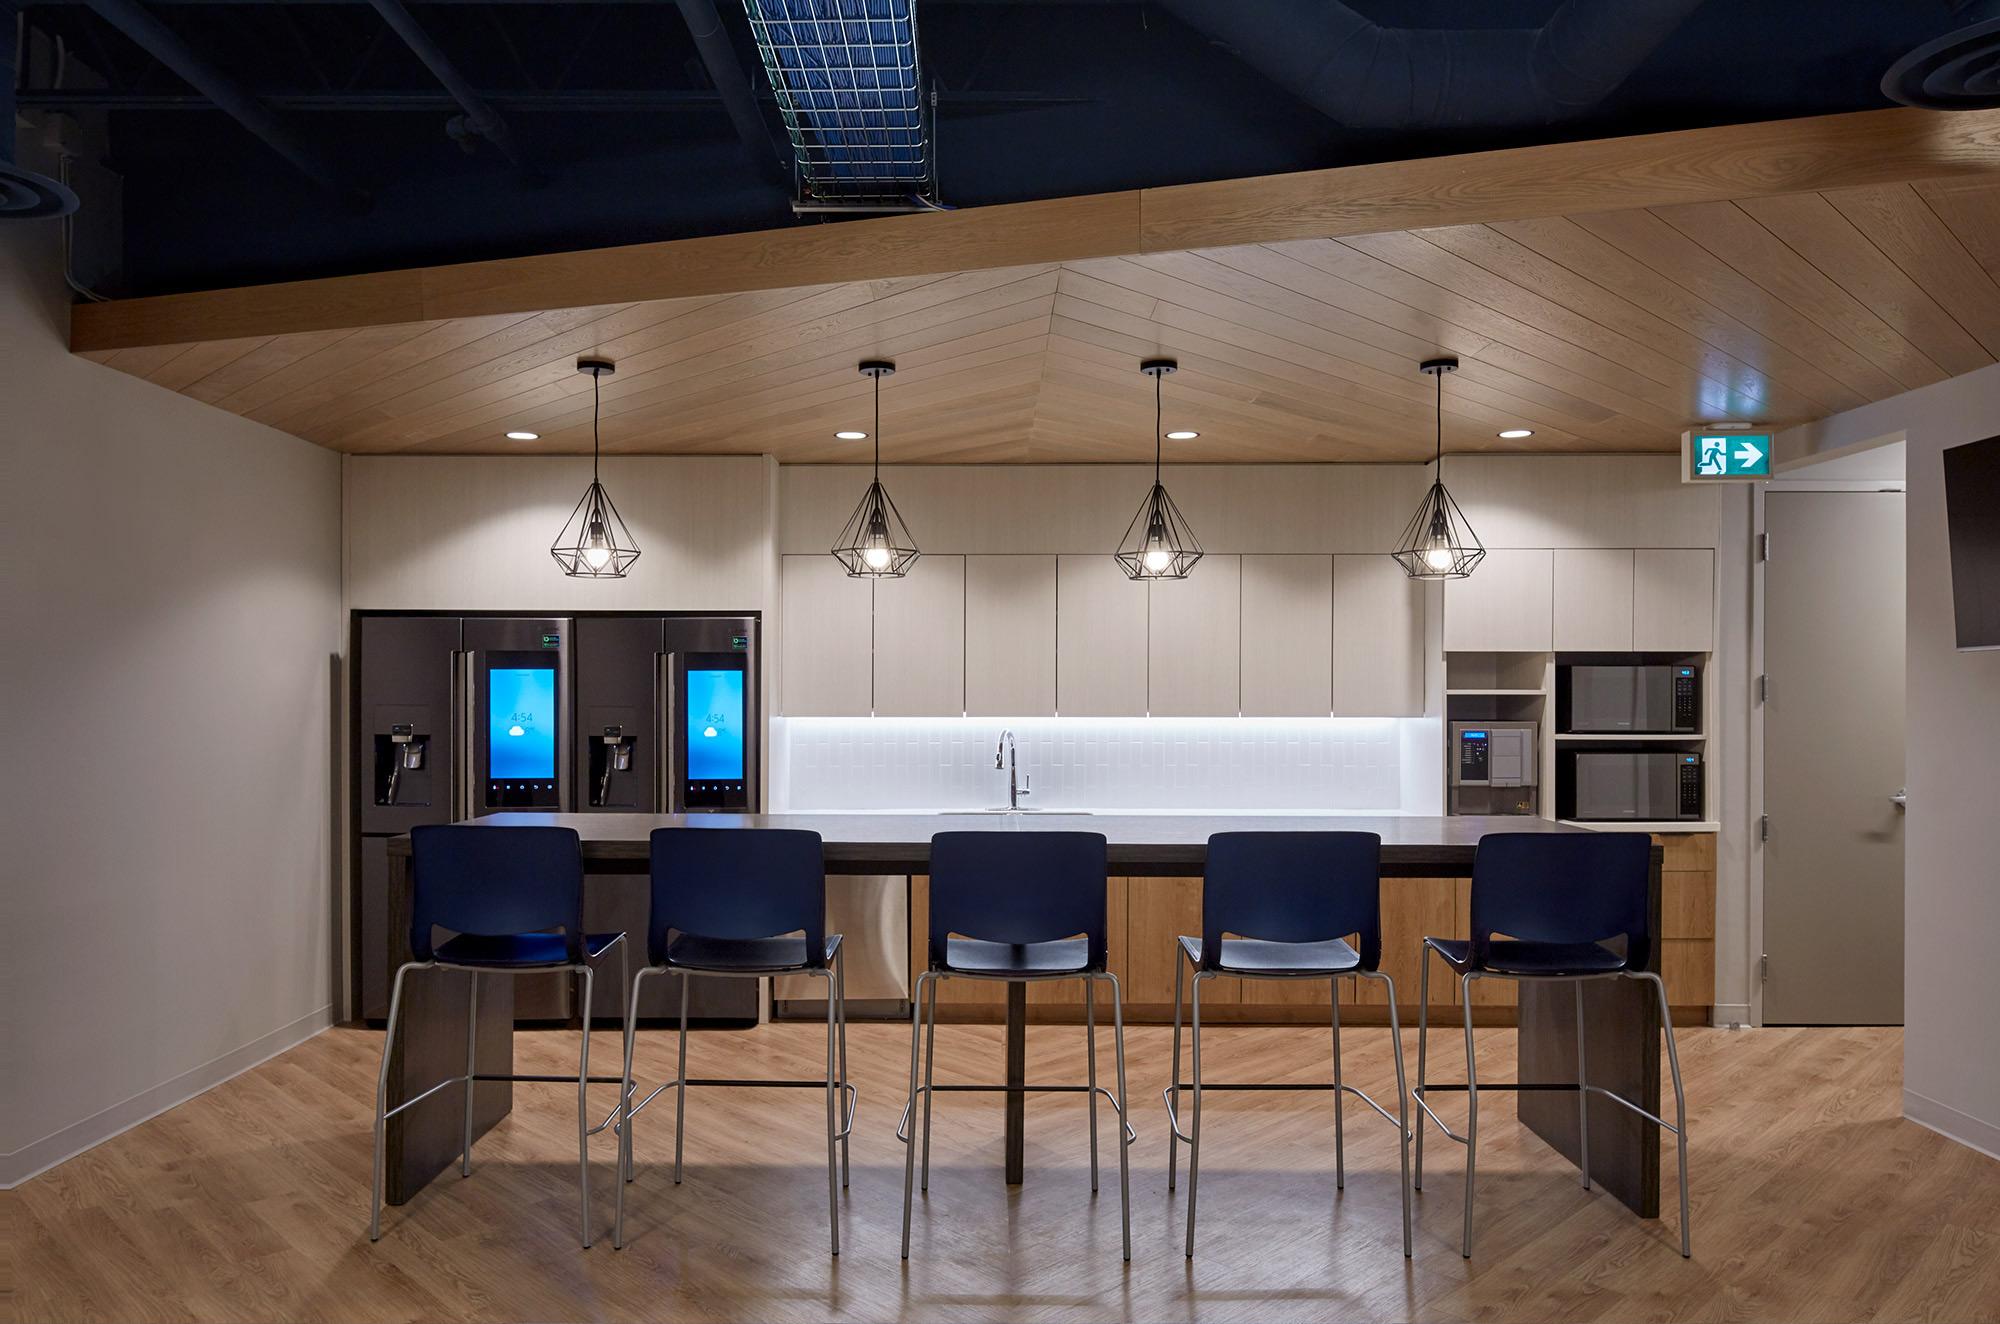 halifax-interior-design-tech-office-cafe.jpg